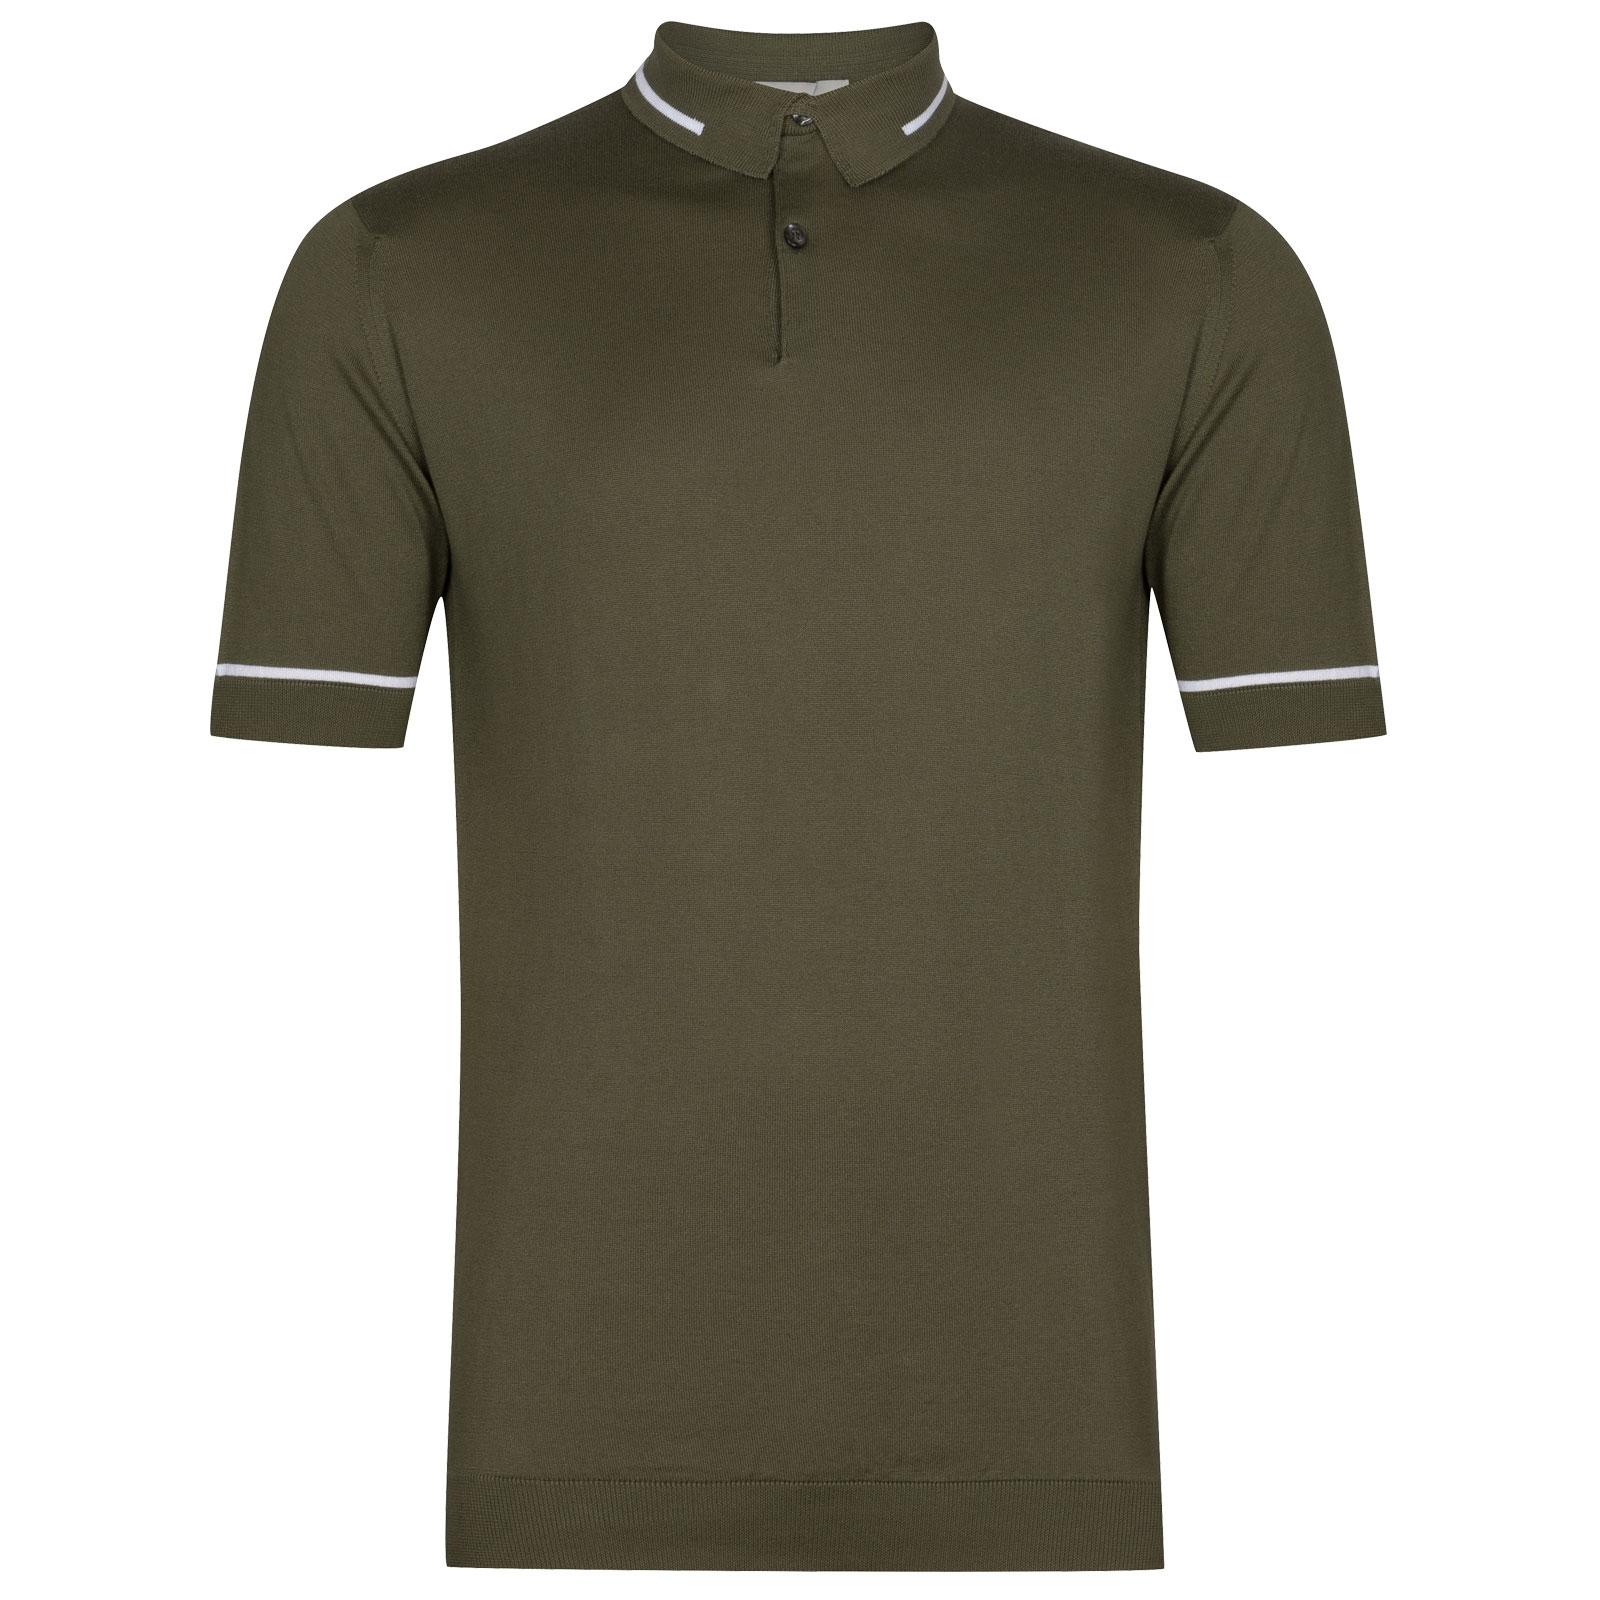 John Smedley Sheldon in Sepal Green Shirt-XLG